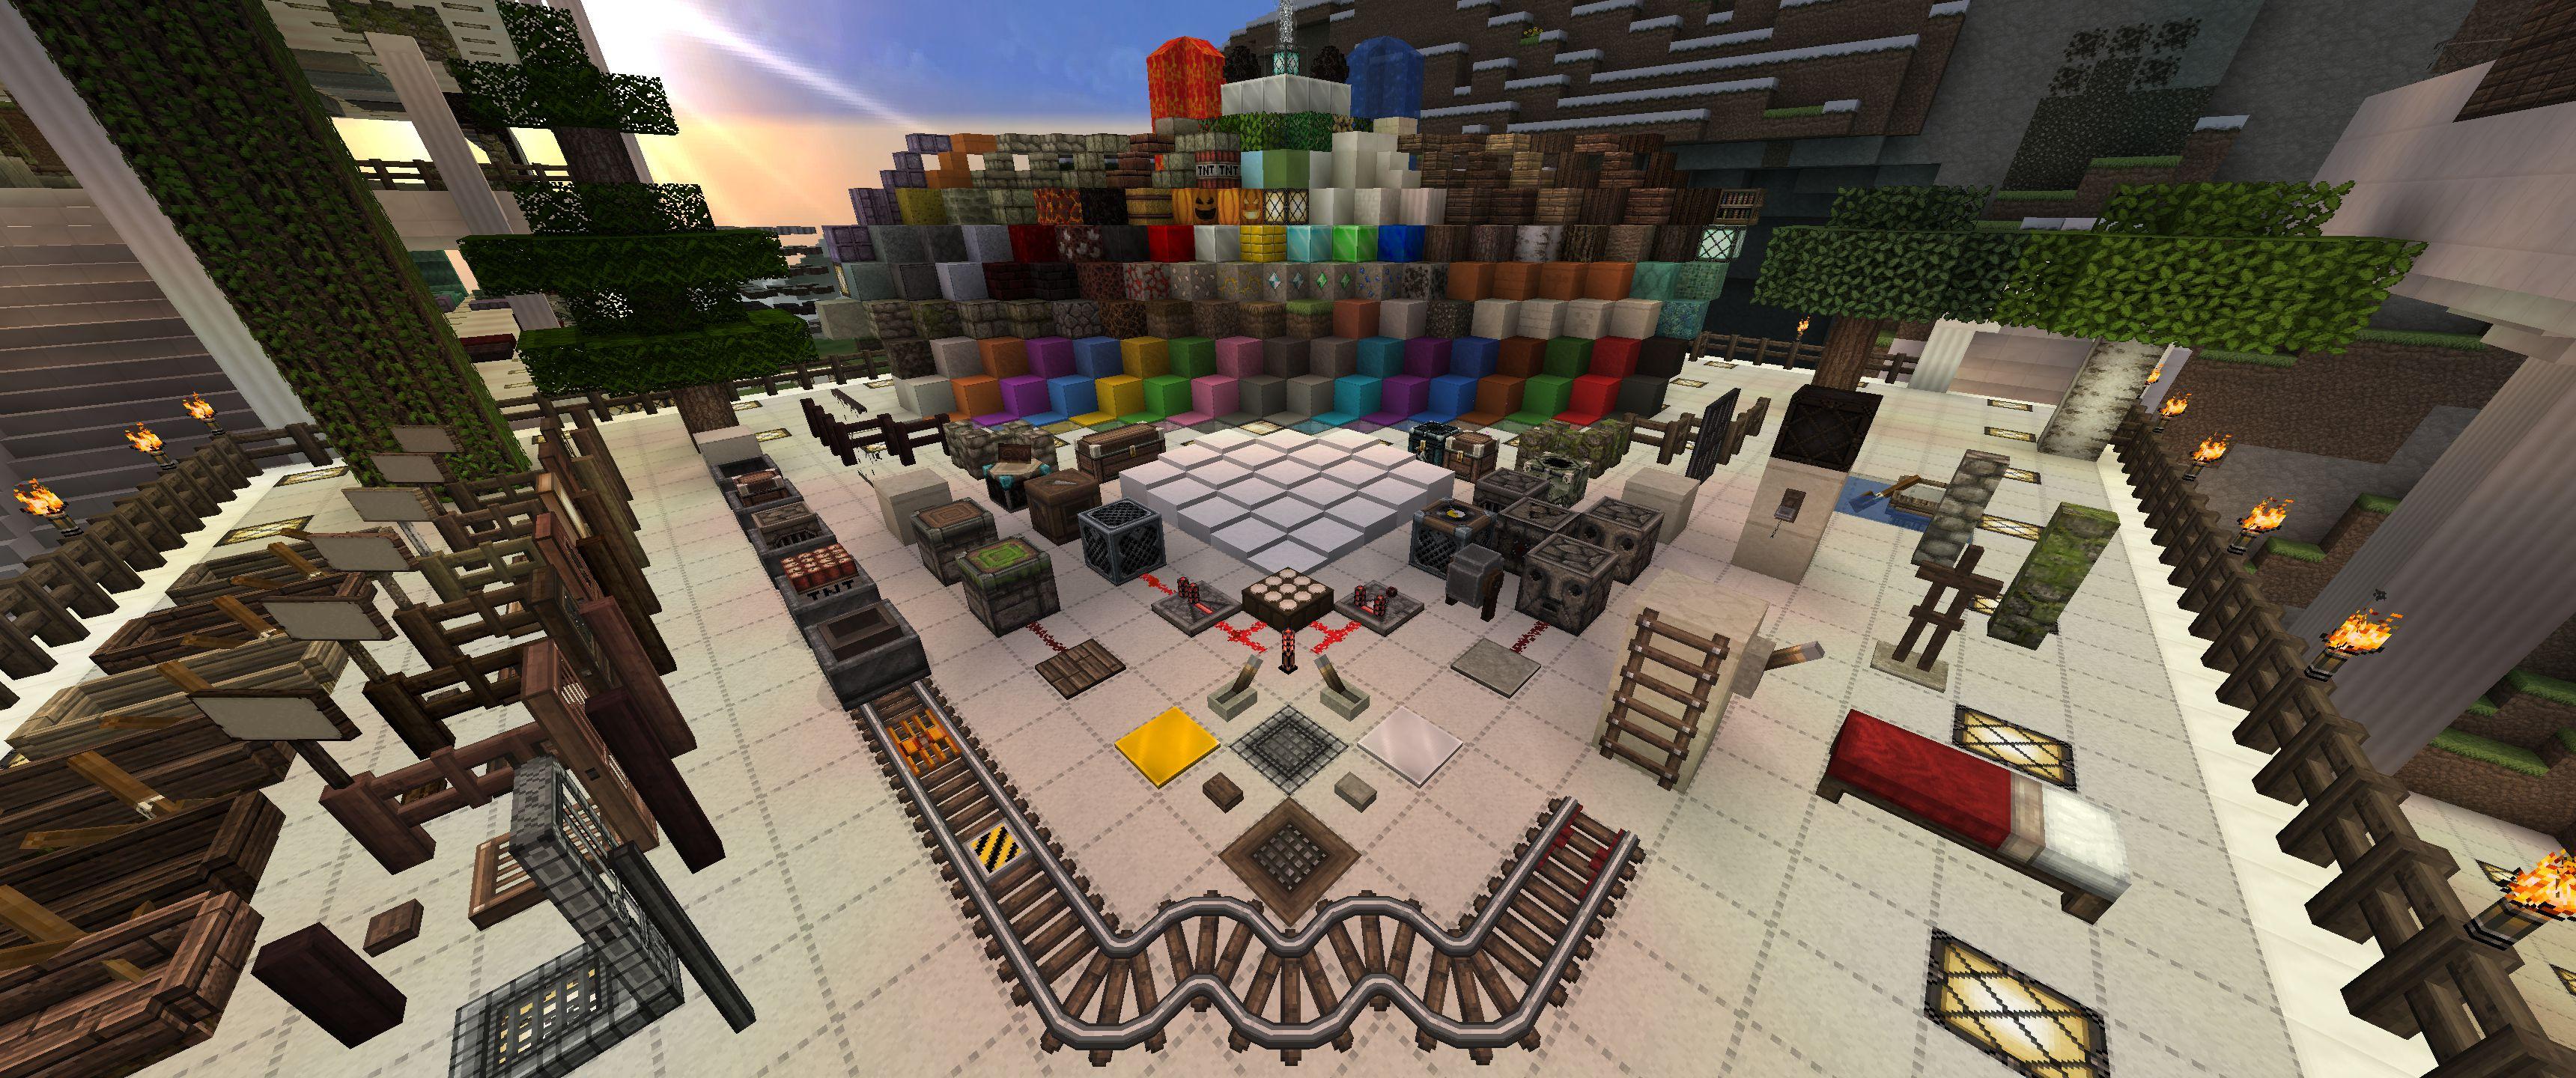 minecraft java edition server 1.12